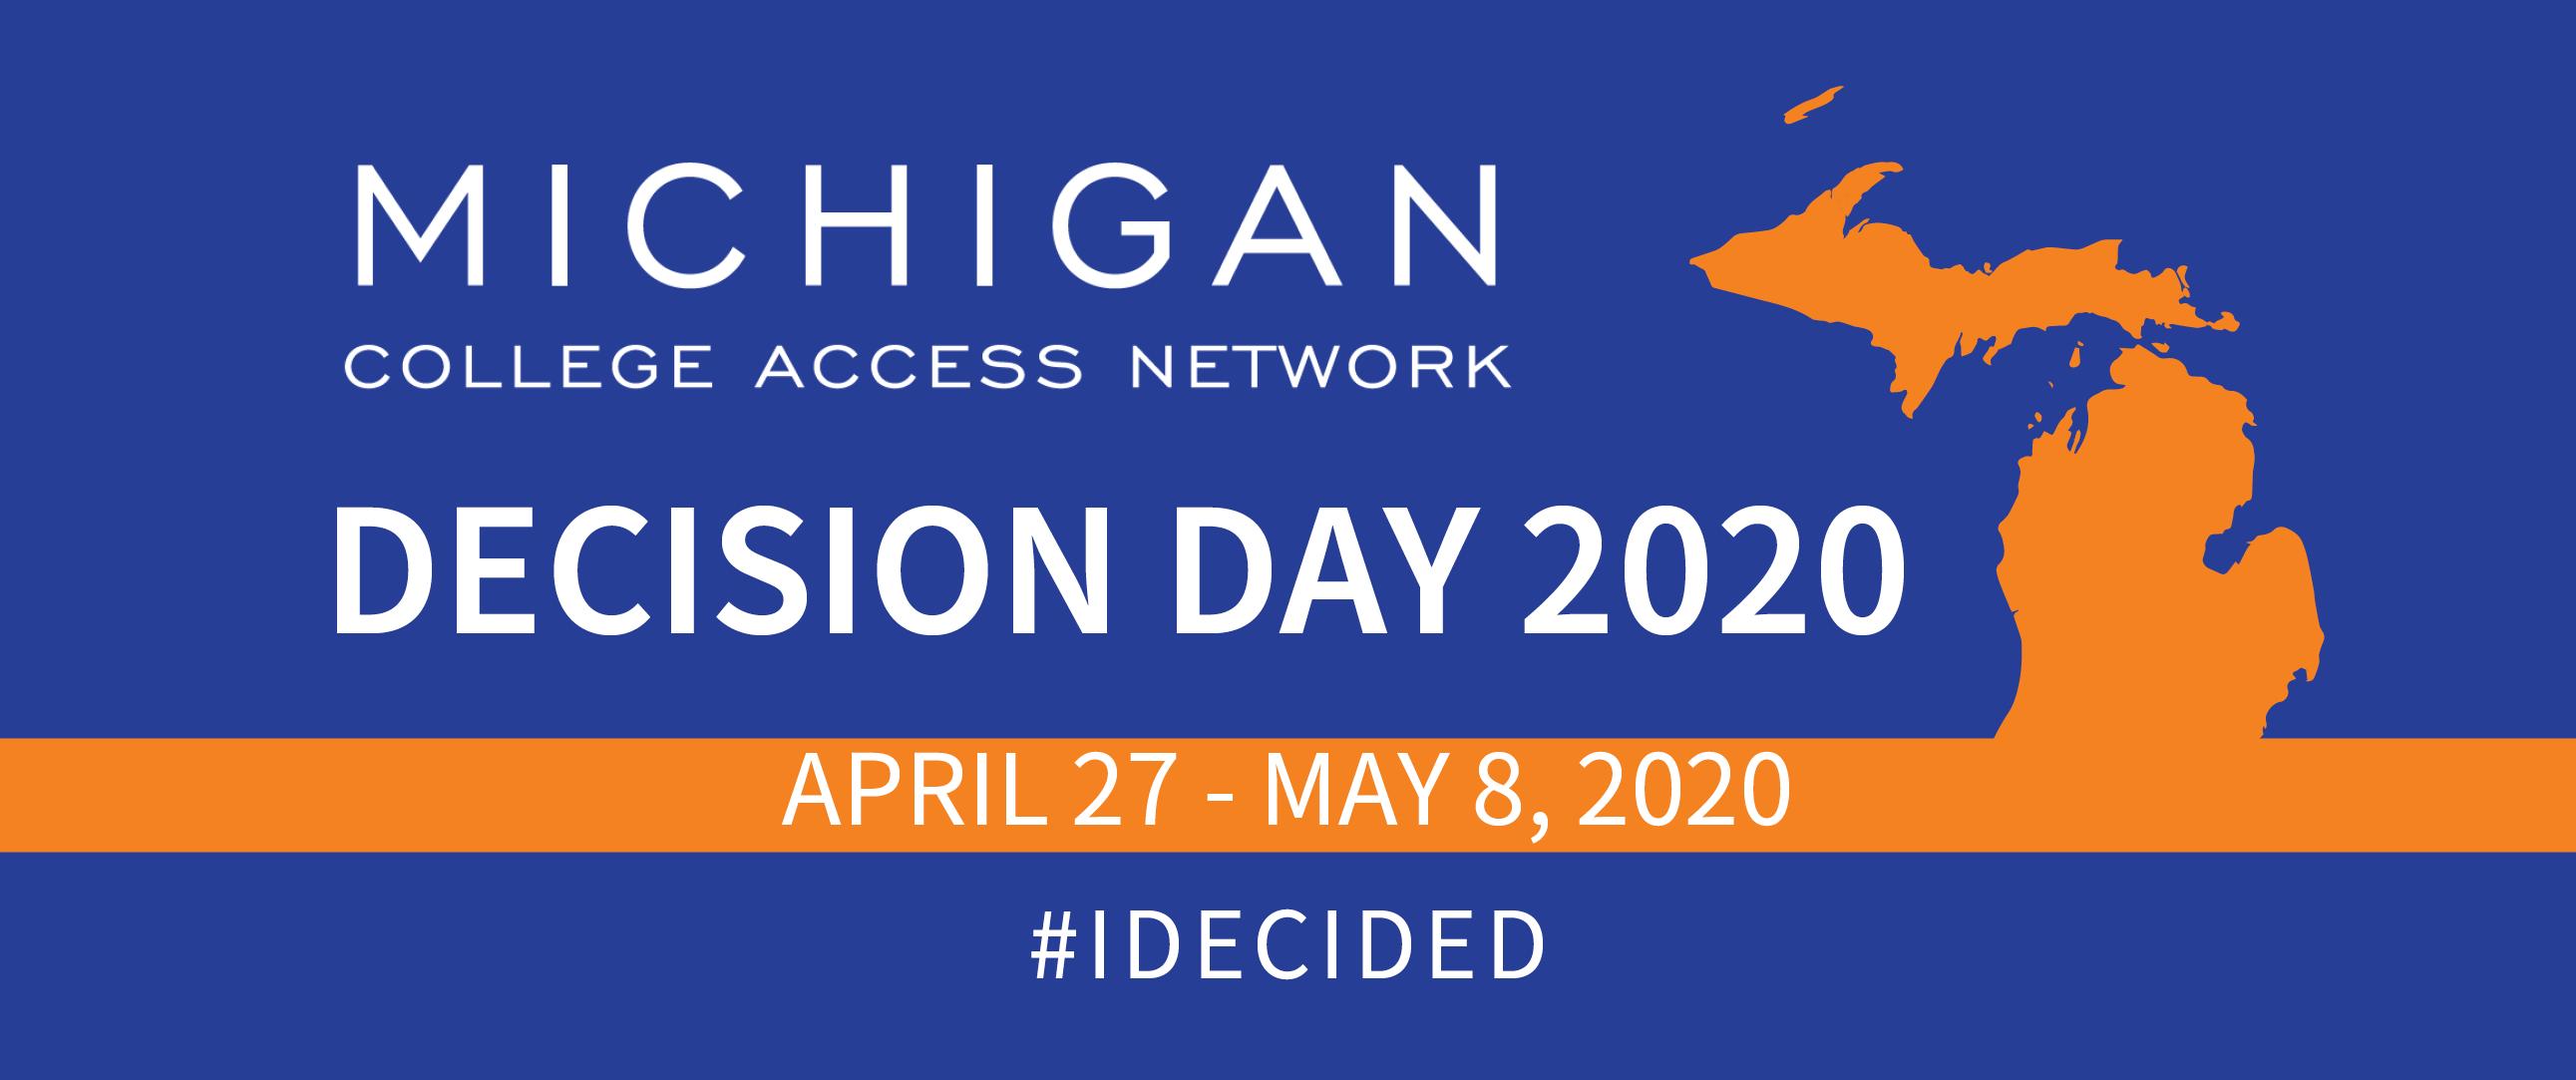 Virtual Decision Day 2020 web banner